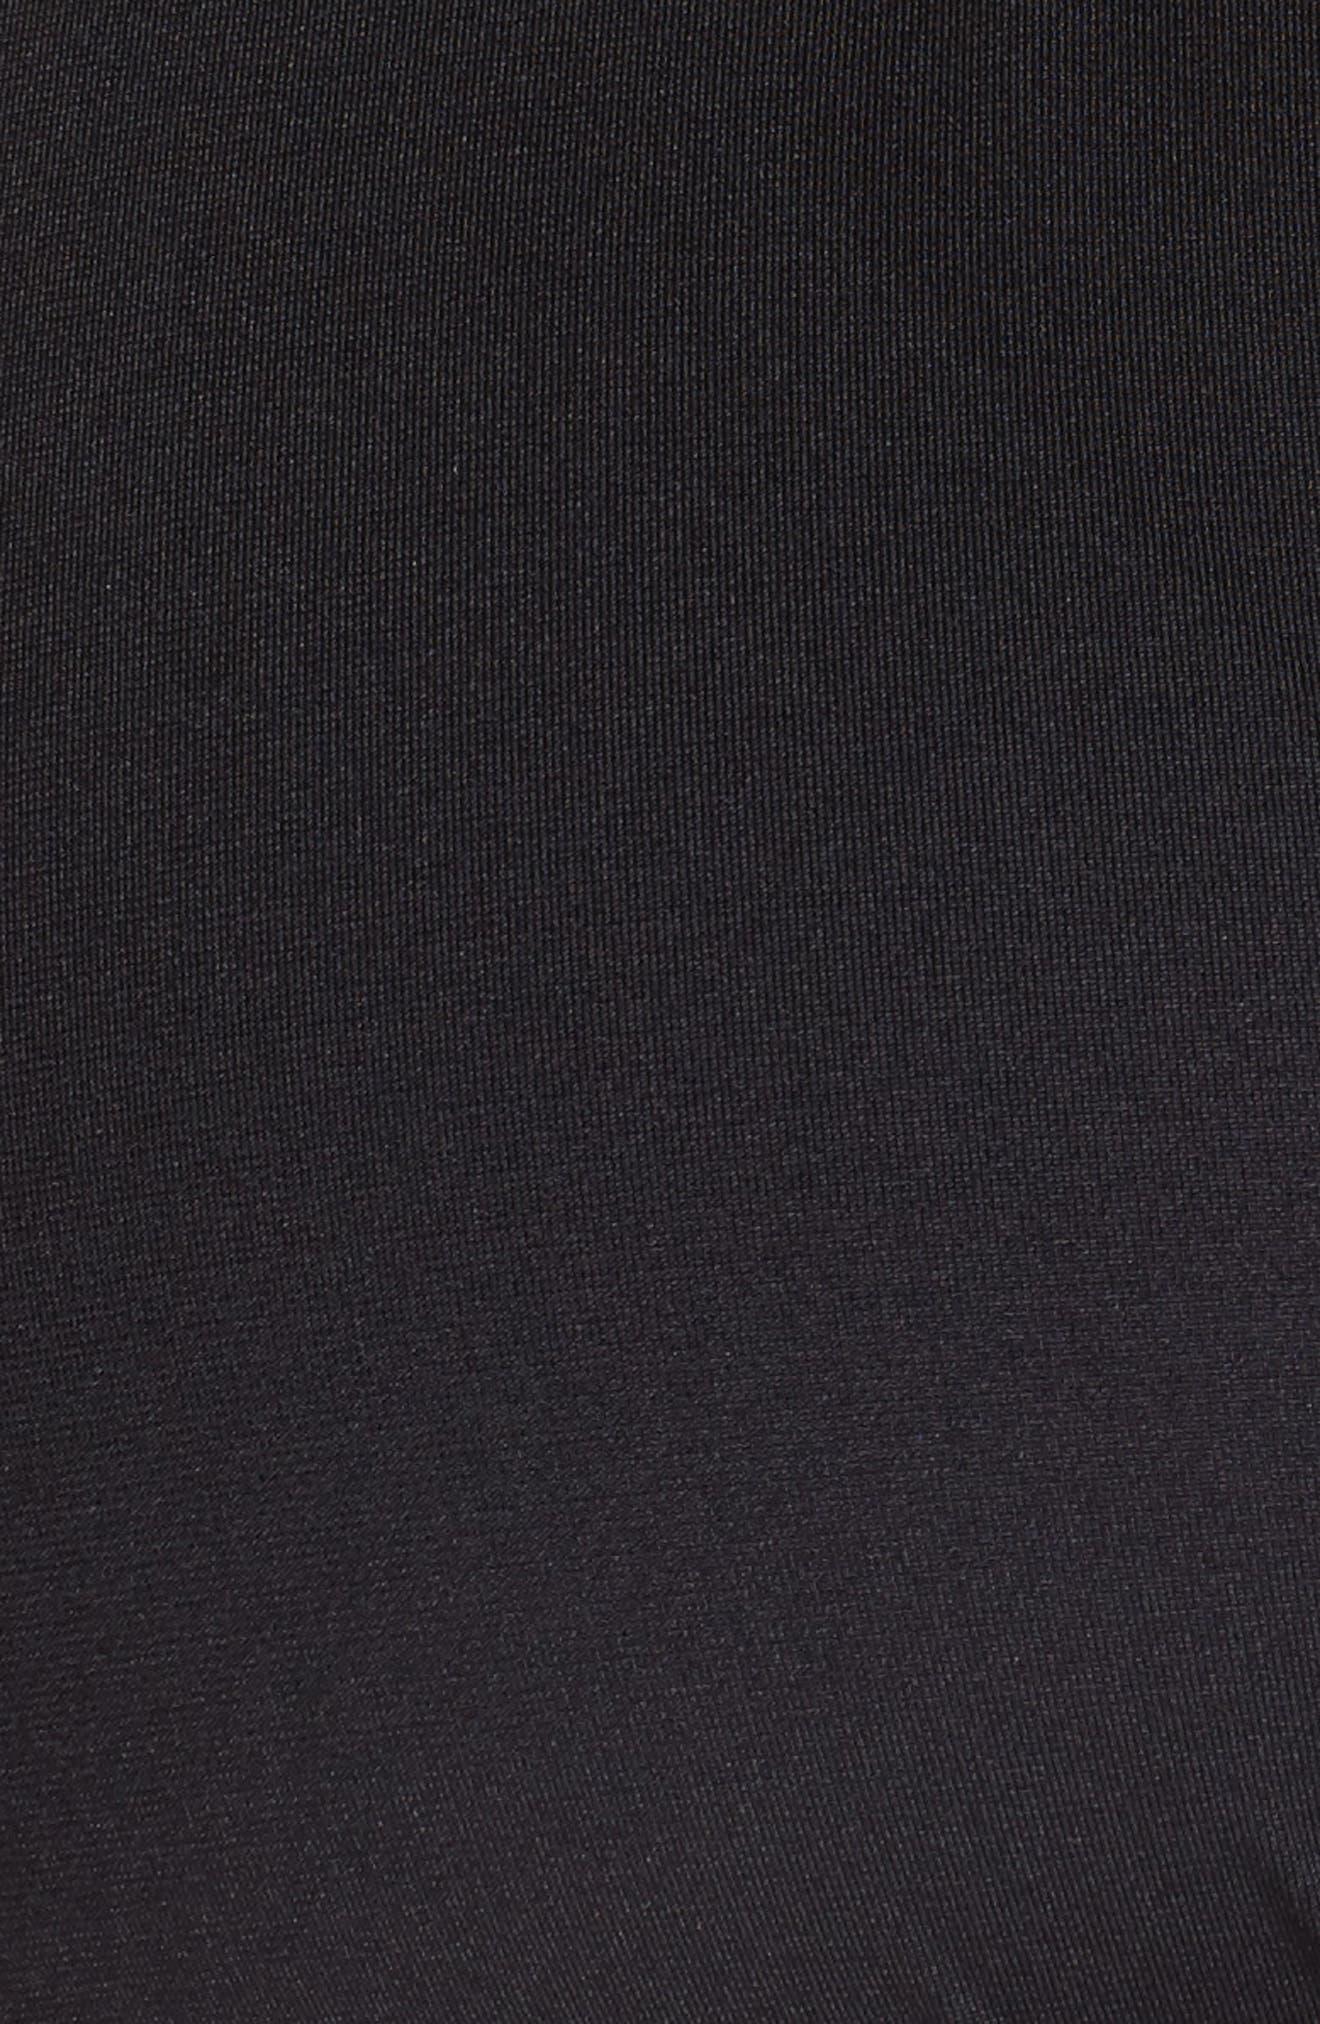 TOMMY BAHAMA, Halter Tankini Top, Alternate thumbnail 5, color, BLACK